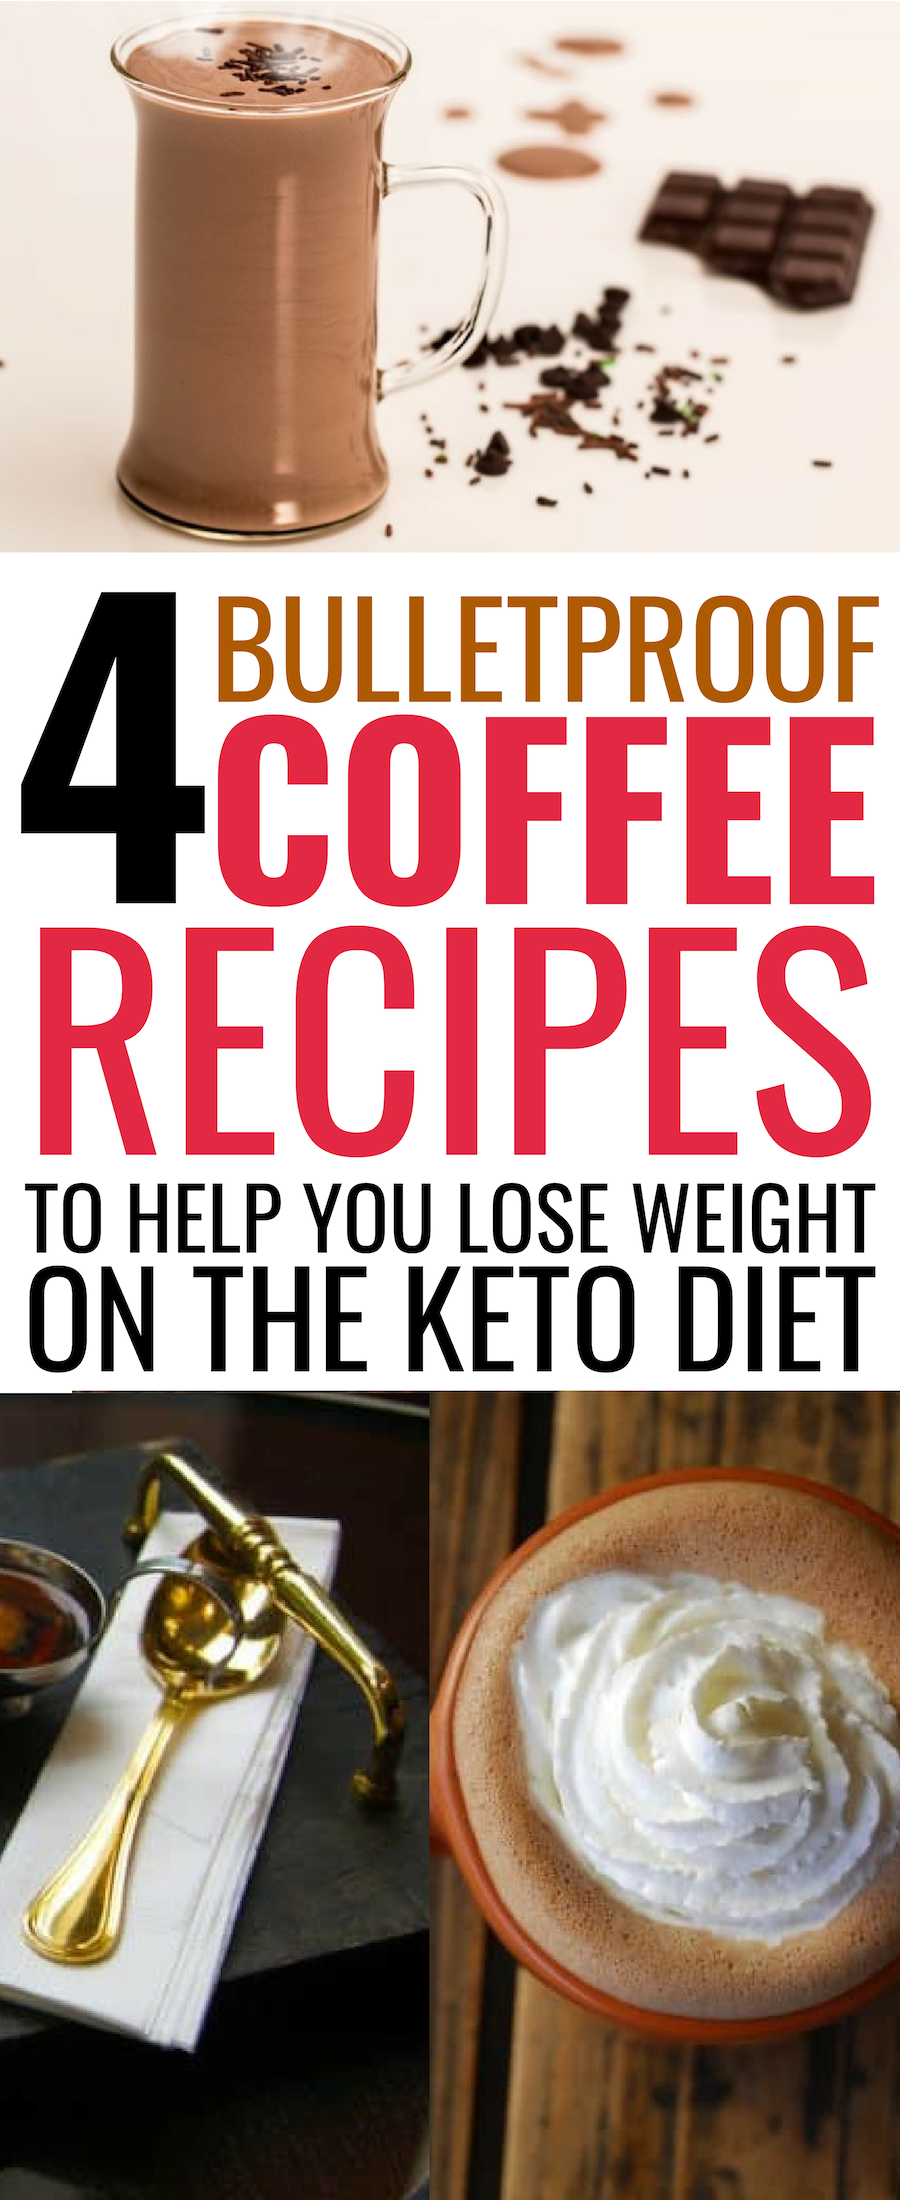 4 Bulletproof Coffee Recipes That'll Make Being On The Keto Diet Easier